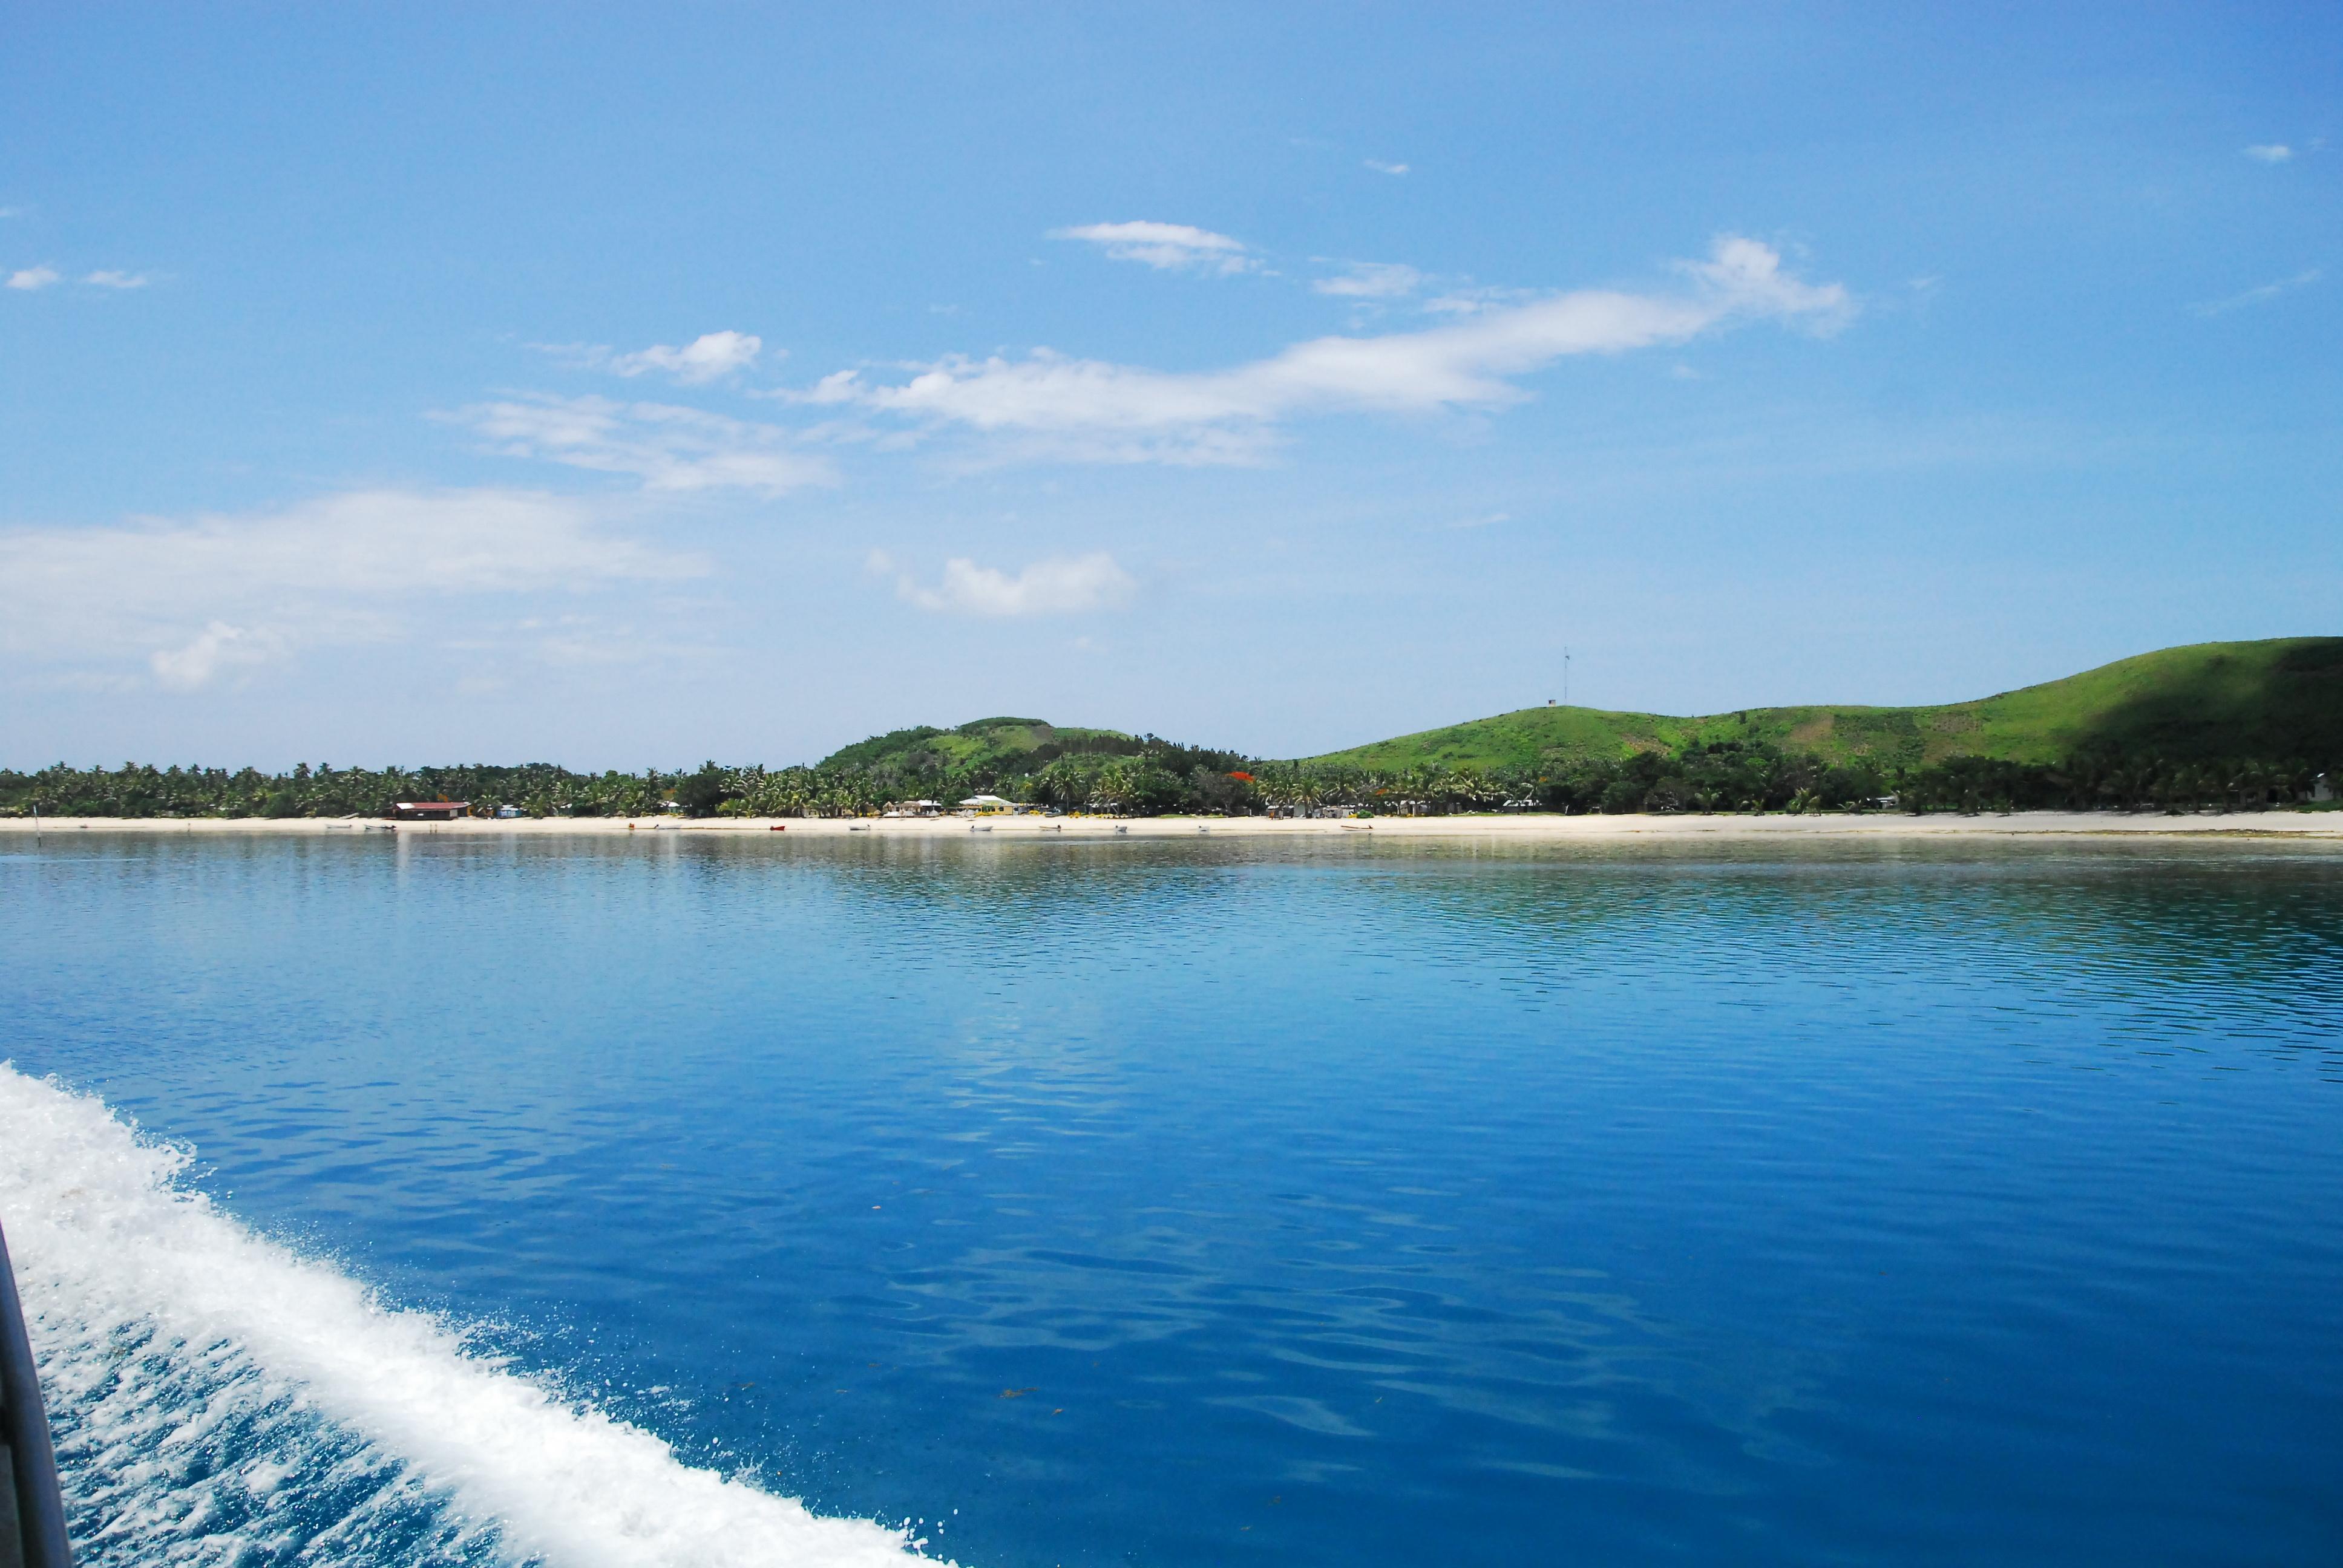 【mana岛旅游景点大全】mana岛旅游攻略